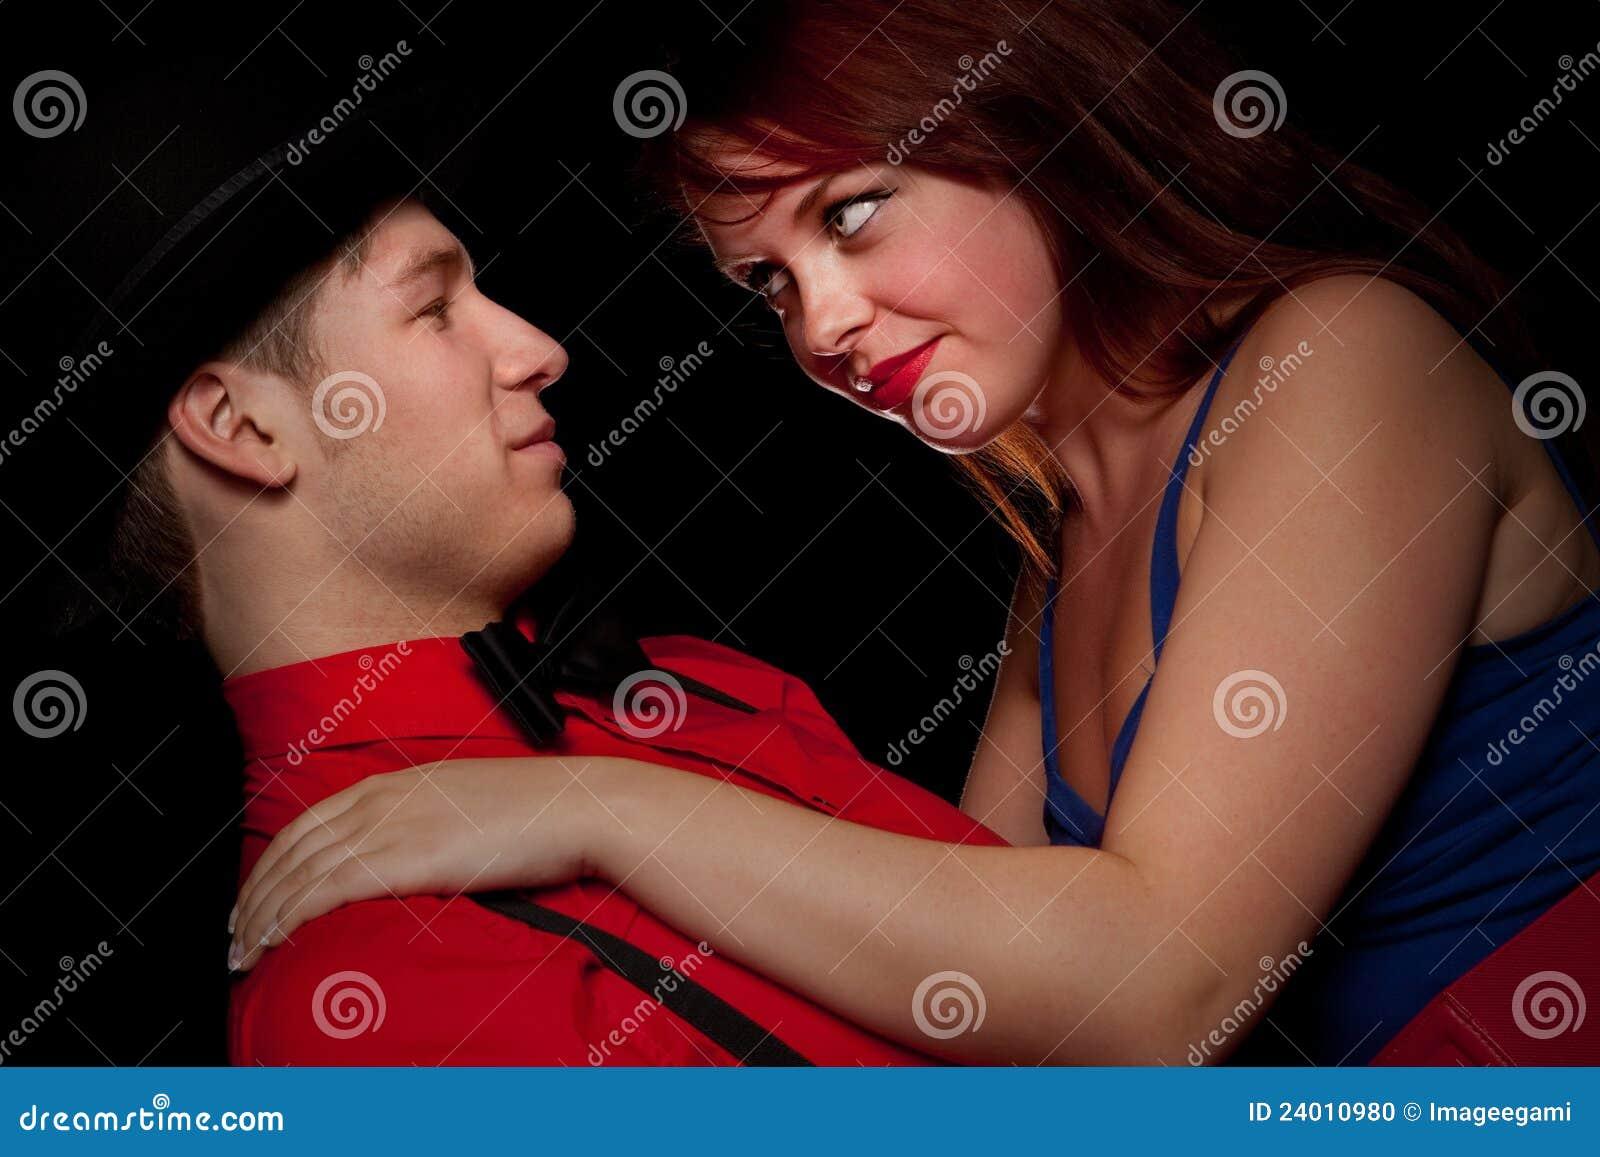 Viva dating site